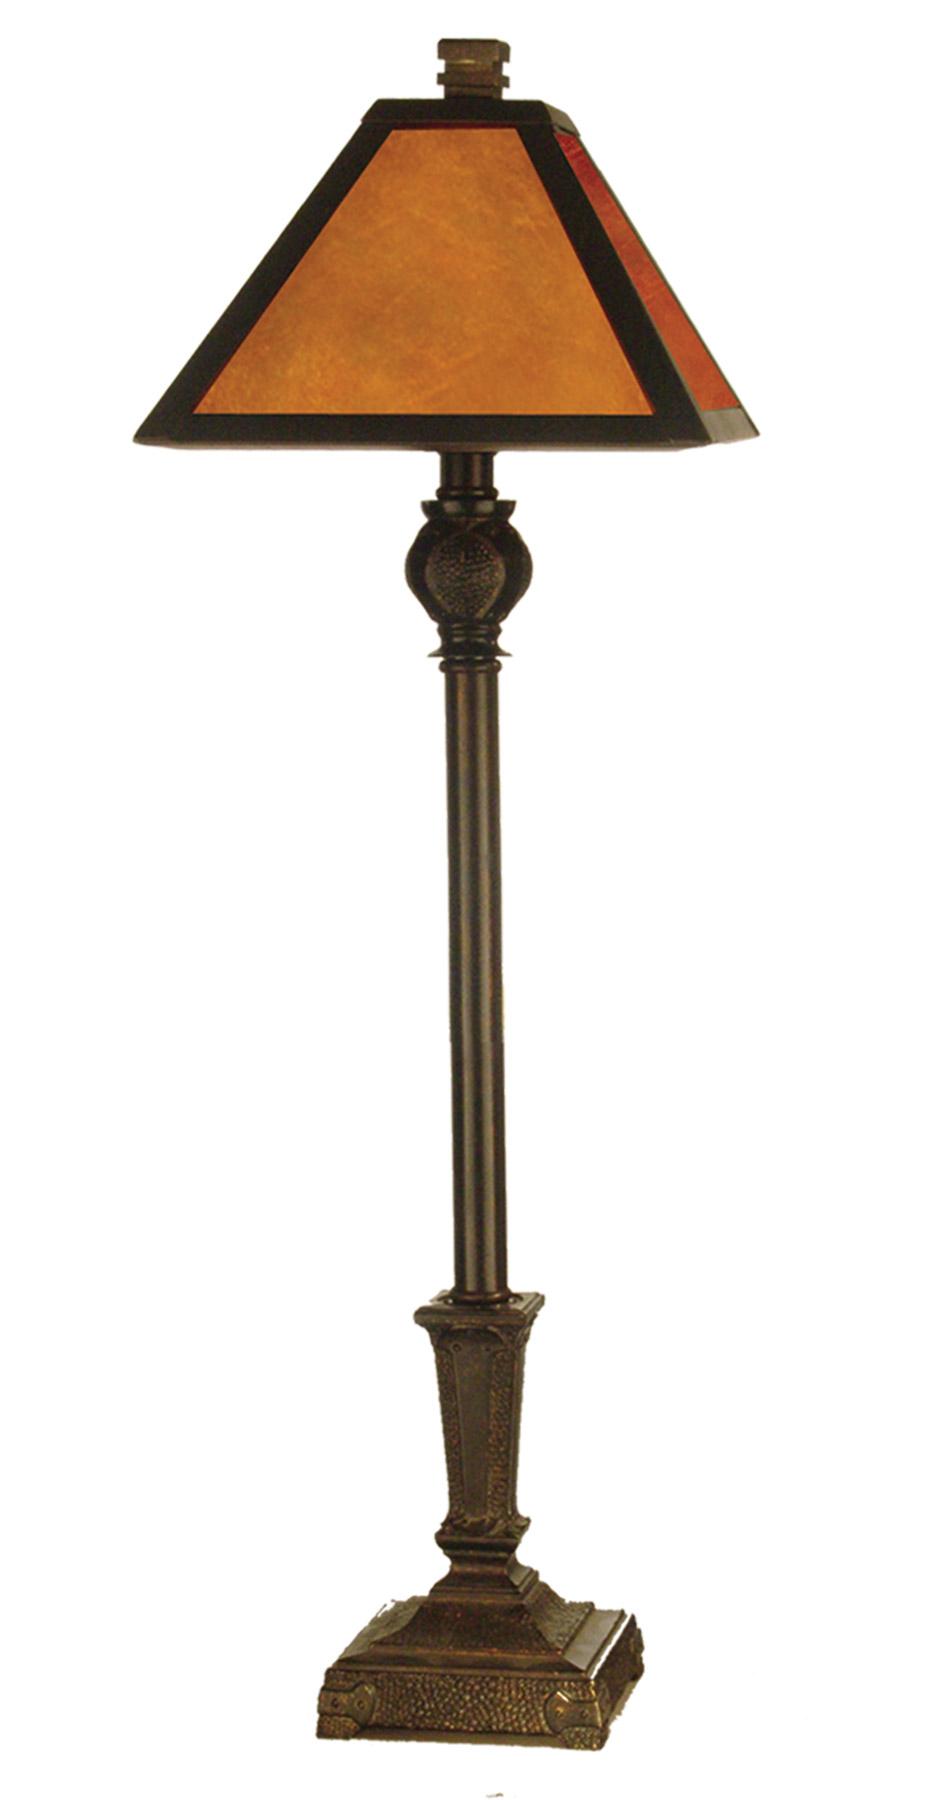 dale tiffany tb11012 craftsman buffet lamp. Black Bedroom Furniture Sets. Home Design Ideas